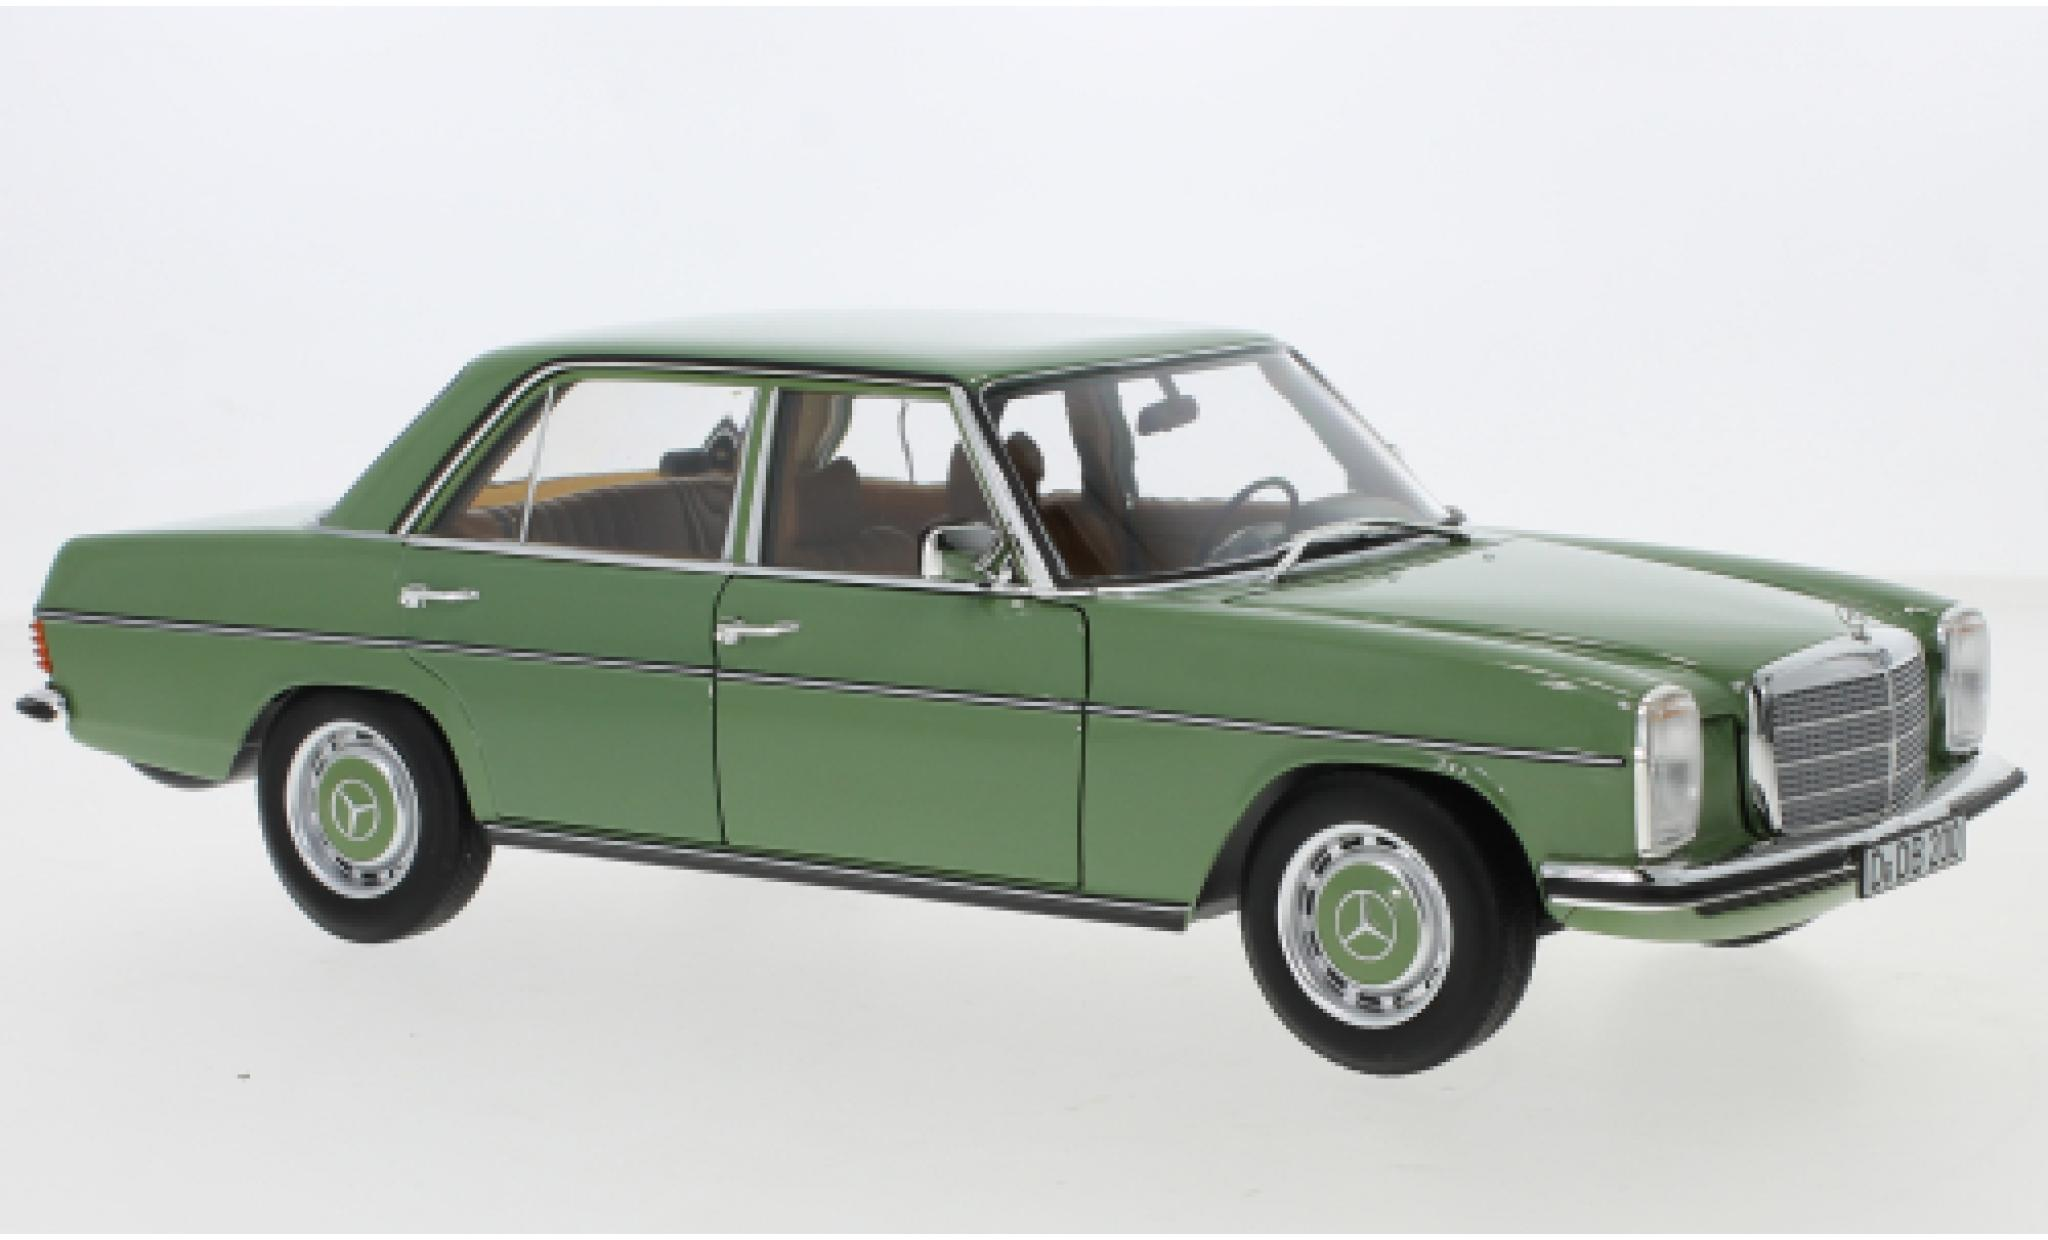 Mercedes 200 1/18 Norev /8 verte 1973